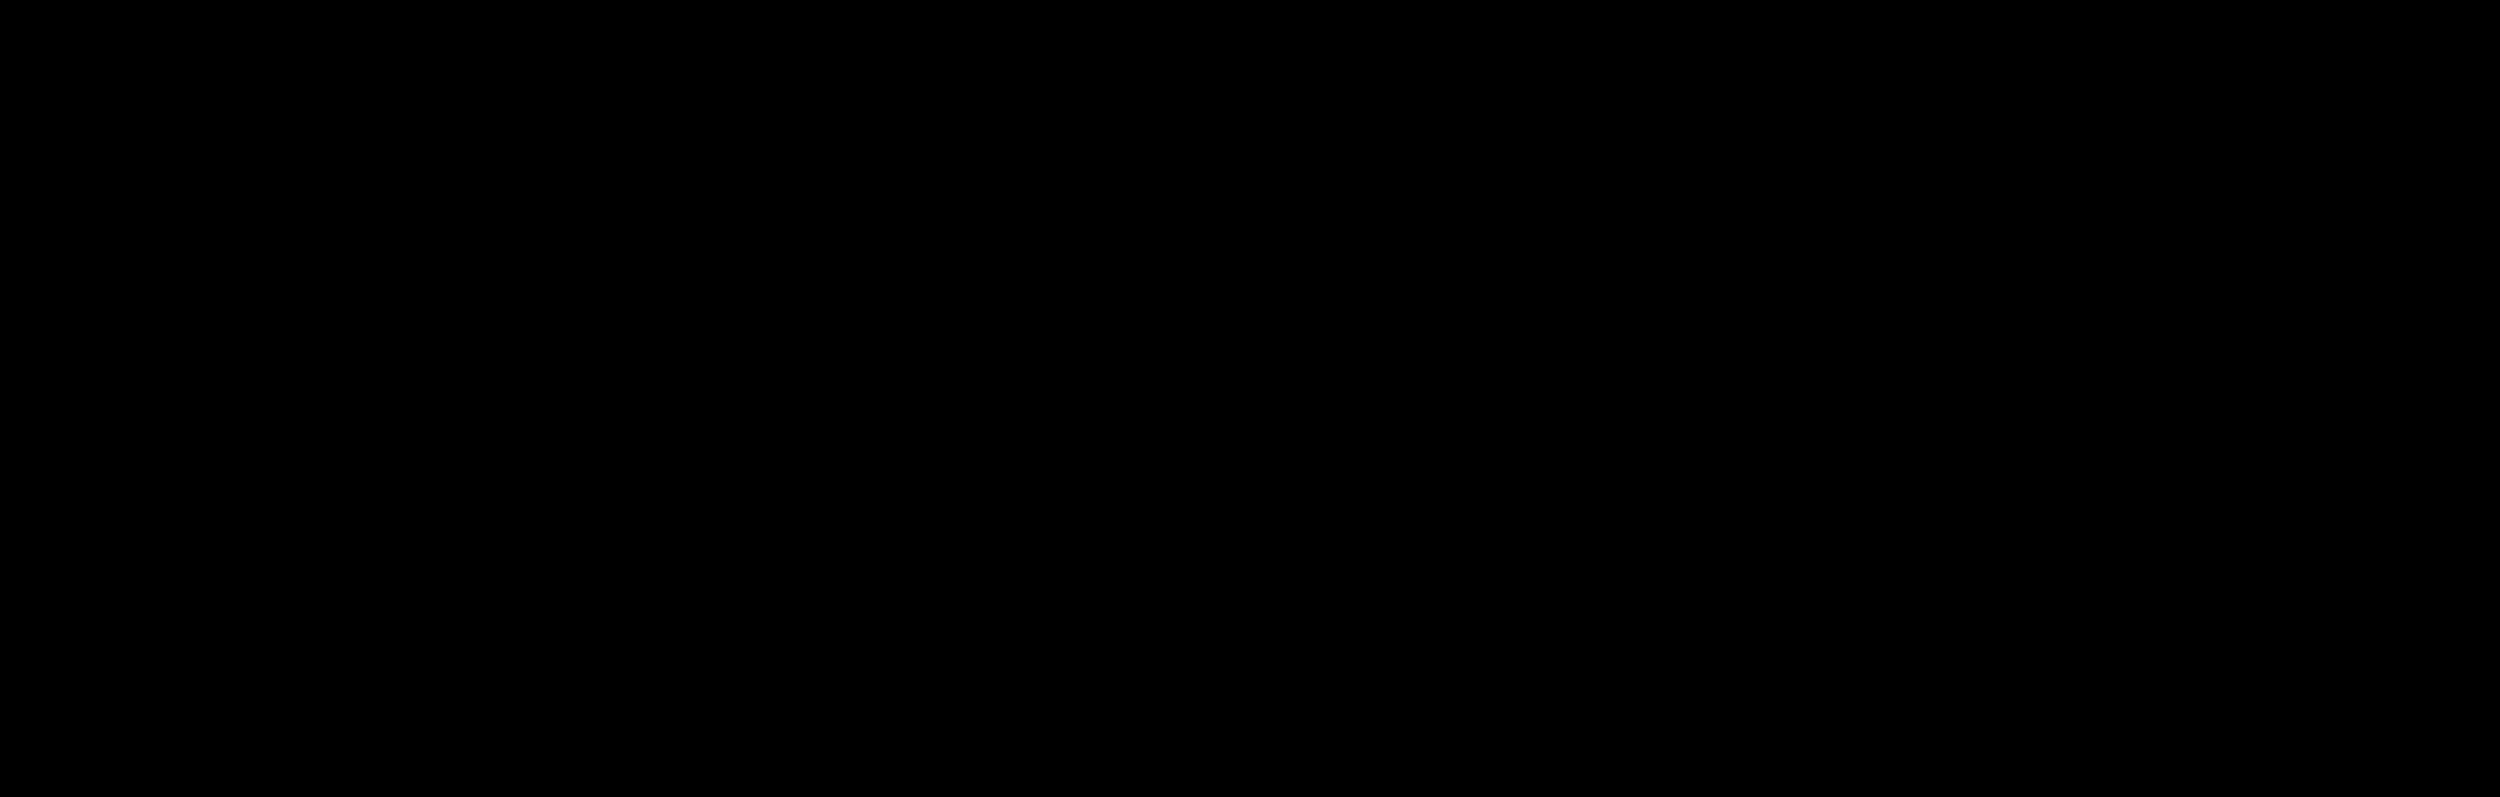 Tasting_Table_logo.png